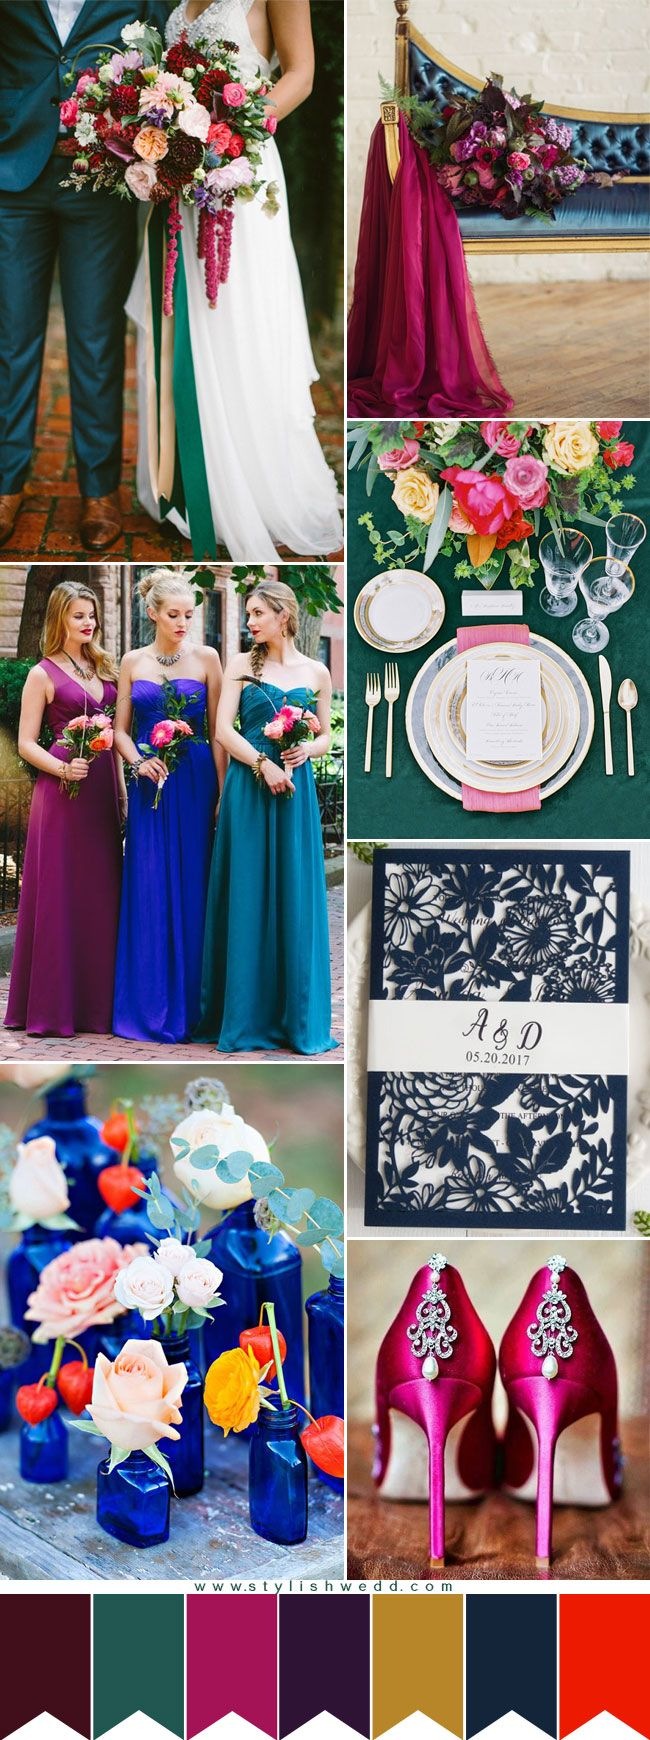 edfa6d7805def Top 10 Perfect Grey Wedding Color Combination Ideas for 2017 Trends .